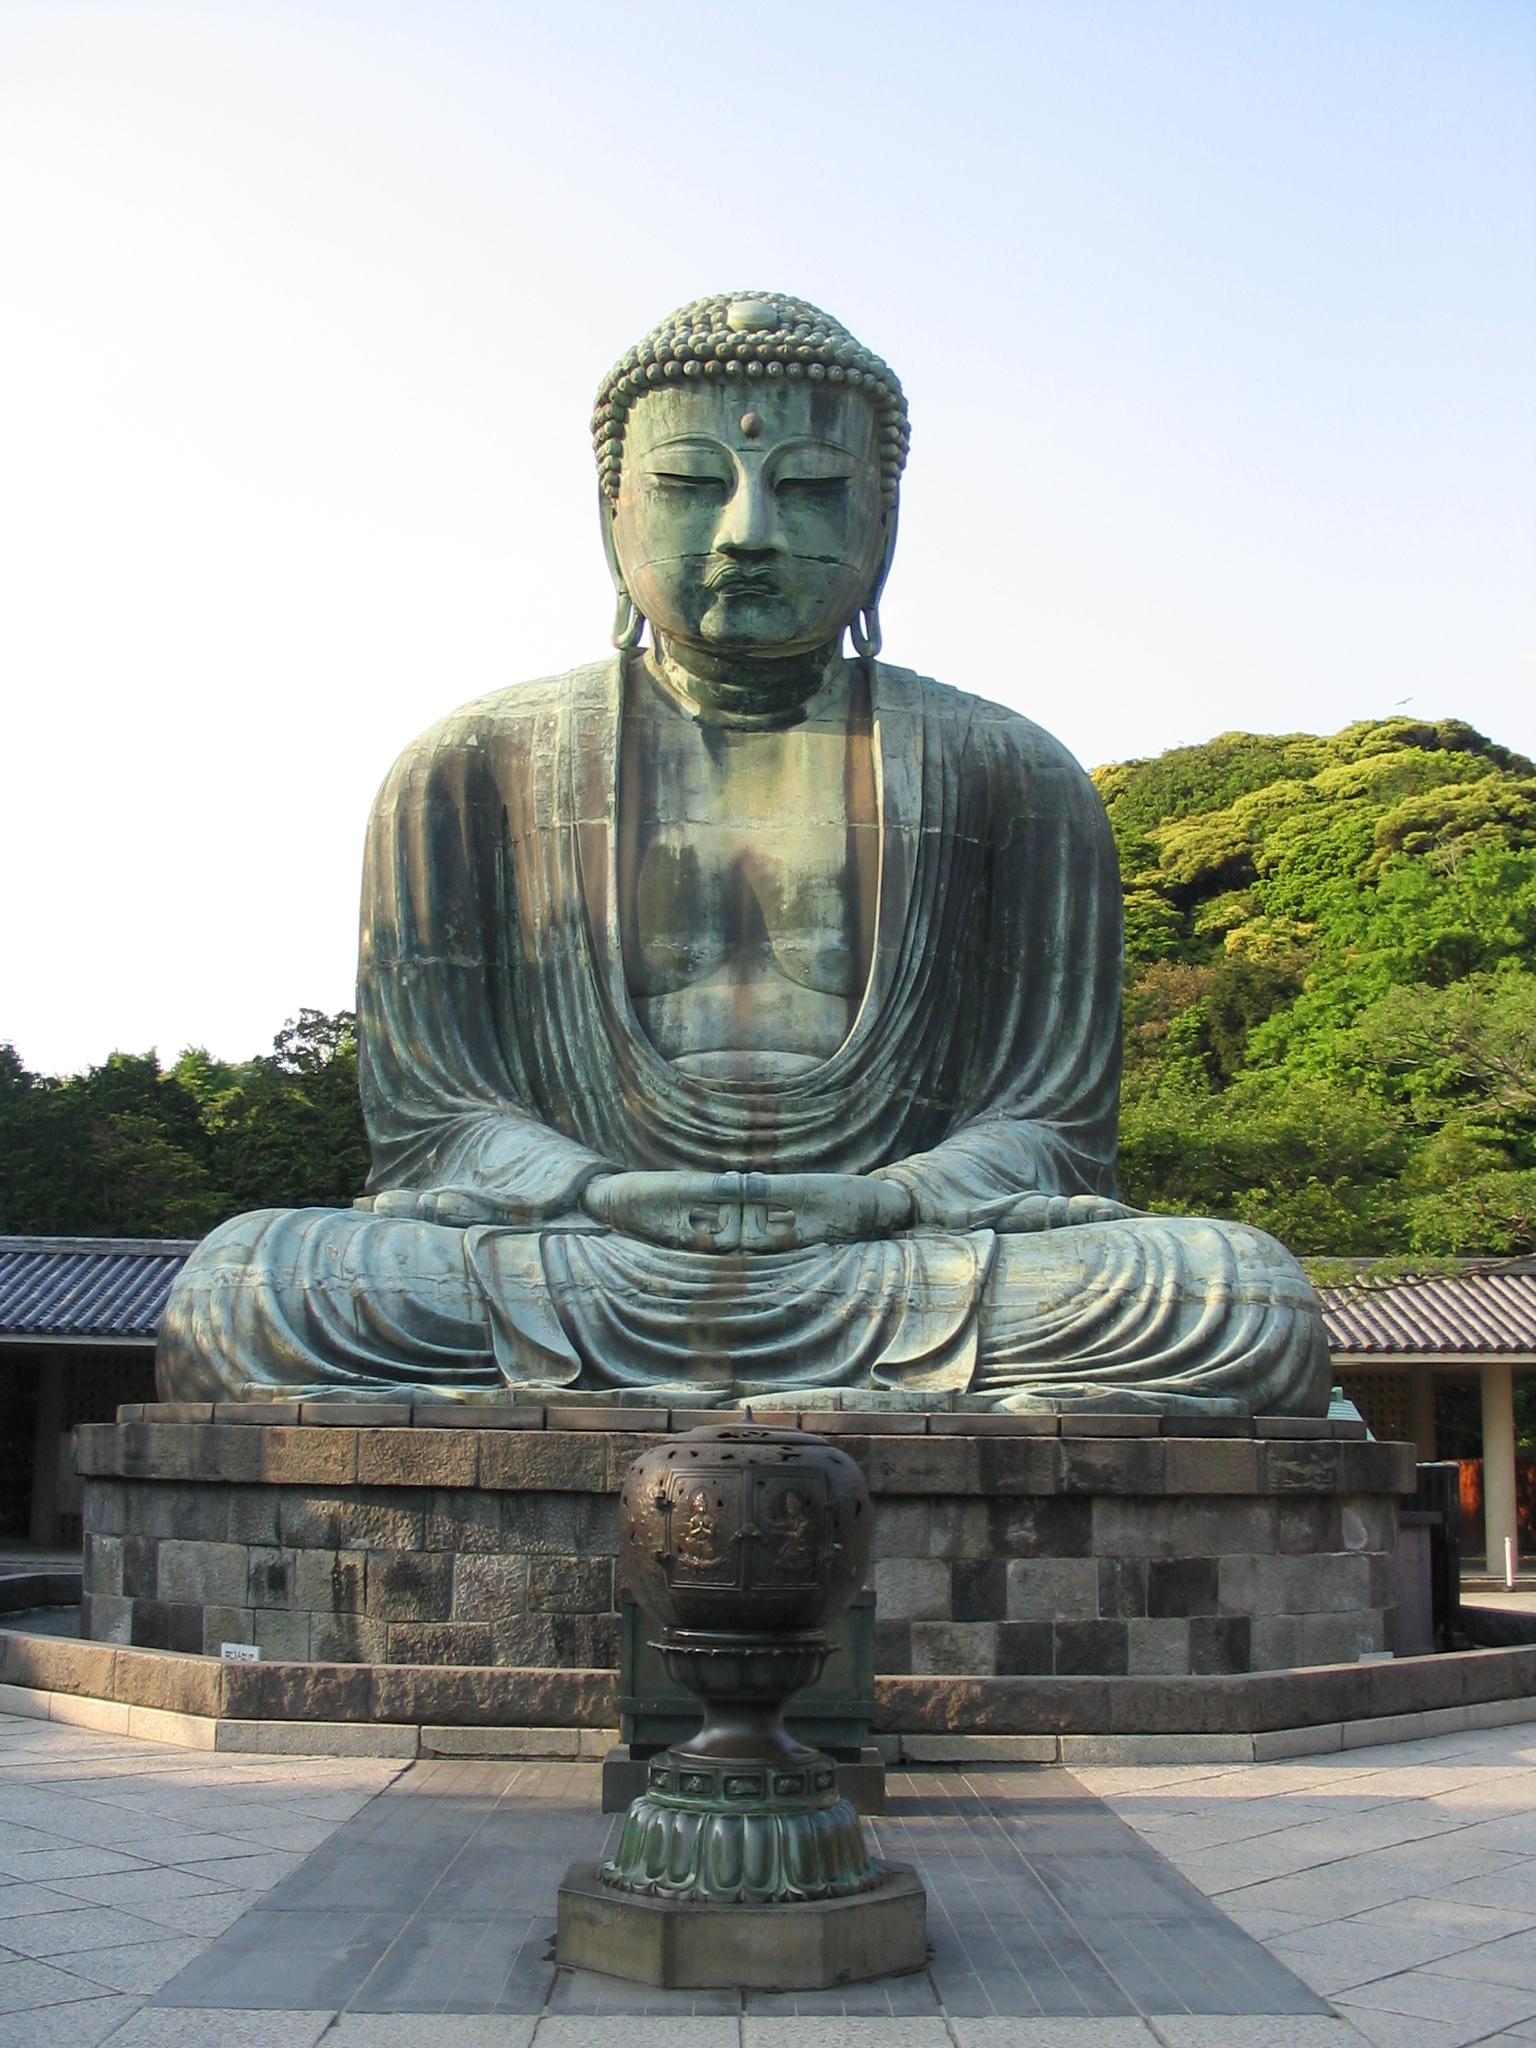 http://upload.wikimedia.org/wikipedia/commons/5/5d/Kamakura_Budda_Daibutsu_front_1885.jpg